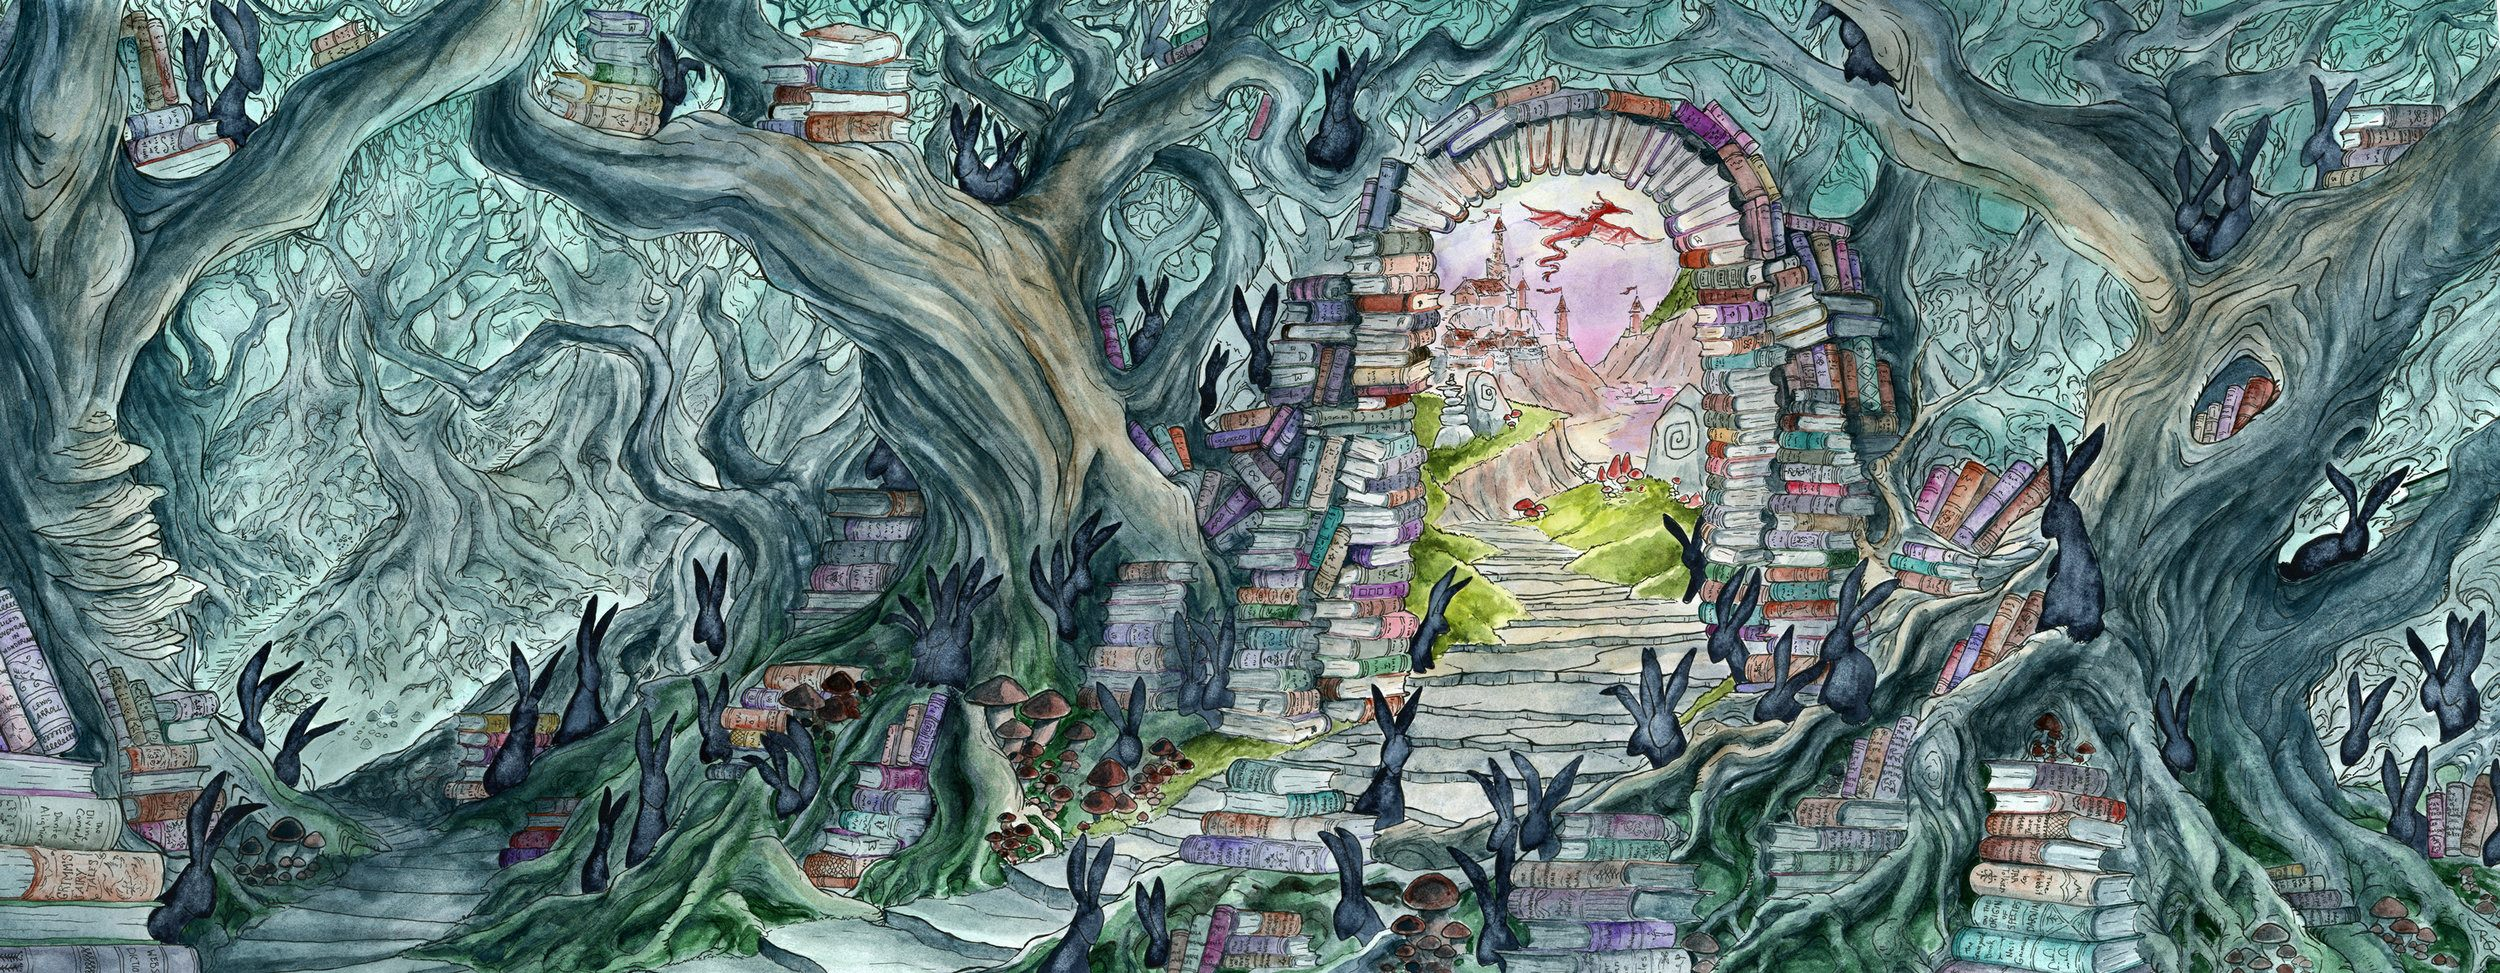 "Rachel Quinlan - ""Portal"" - Promotional image for the Detroit Festival of Books, June 2018"